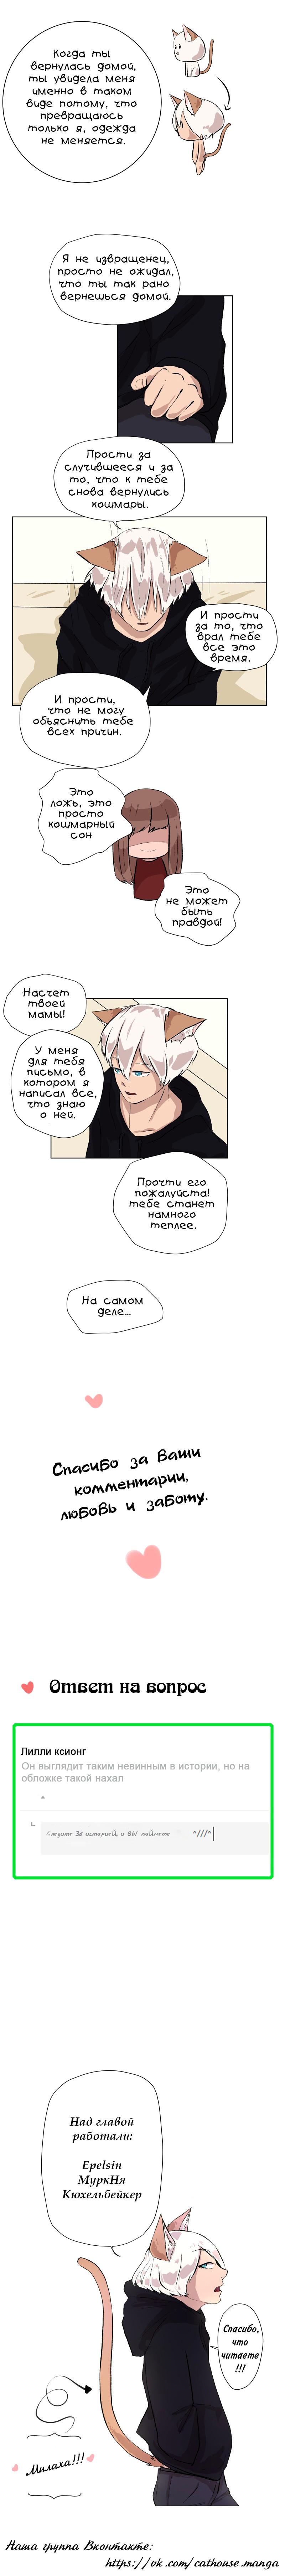 https://r1.ninemanga.com/comics/pic2/58/31802/317236/1485407502856.jpg Page 3